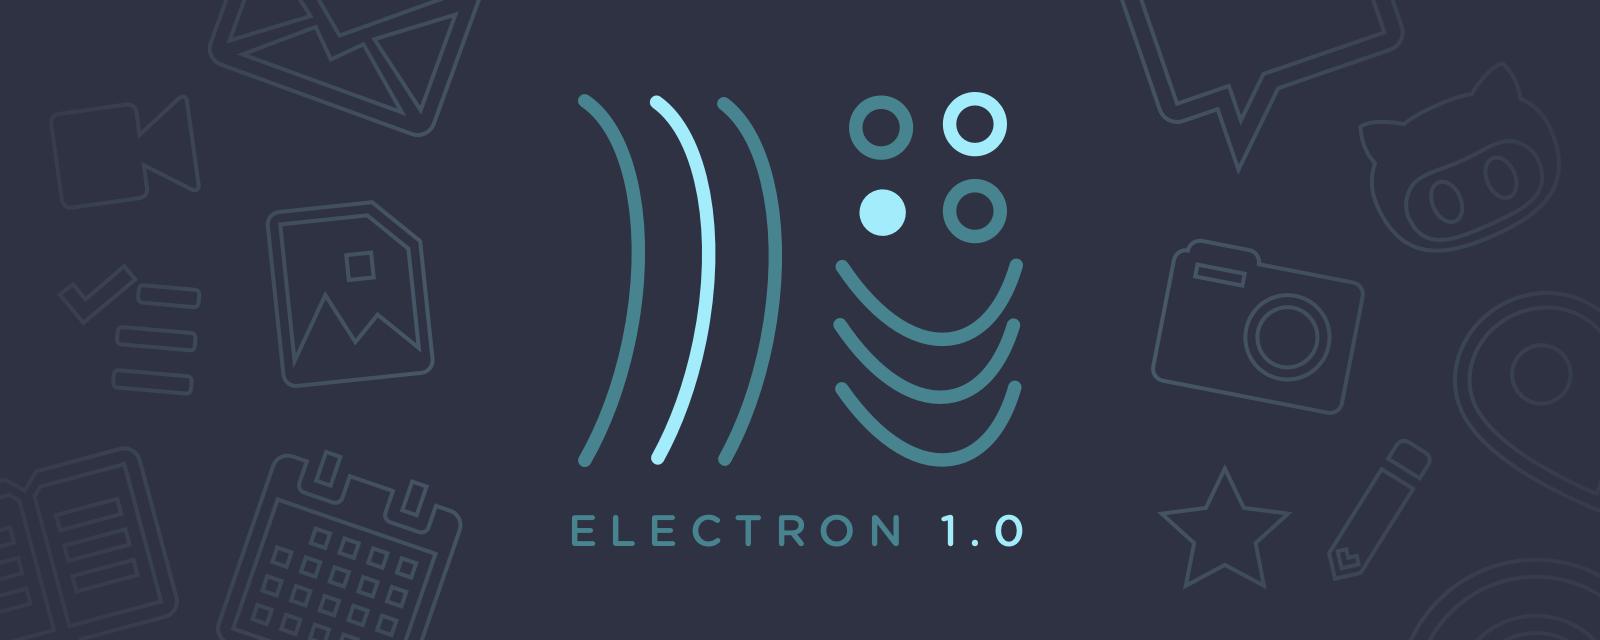 Electron 1.0: App cross-platform con JavaScript, HTML e CSS